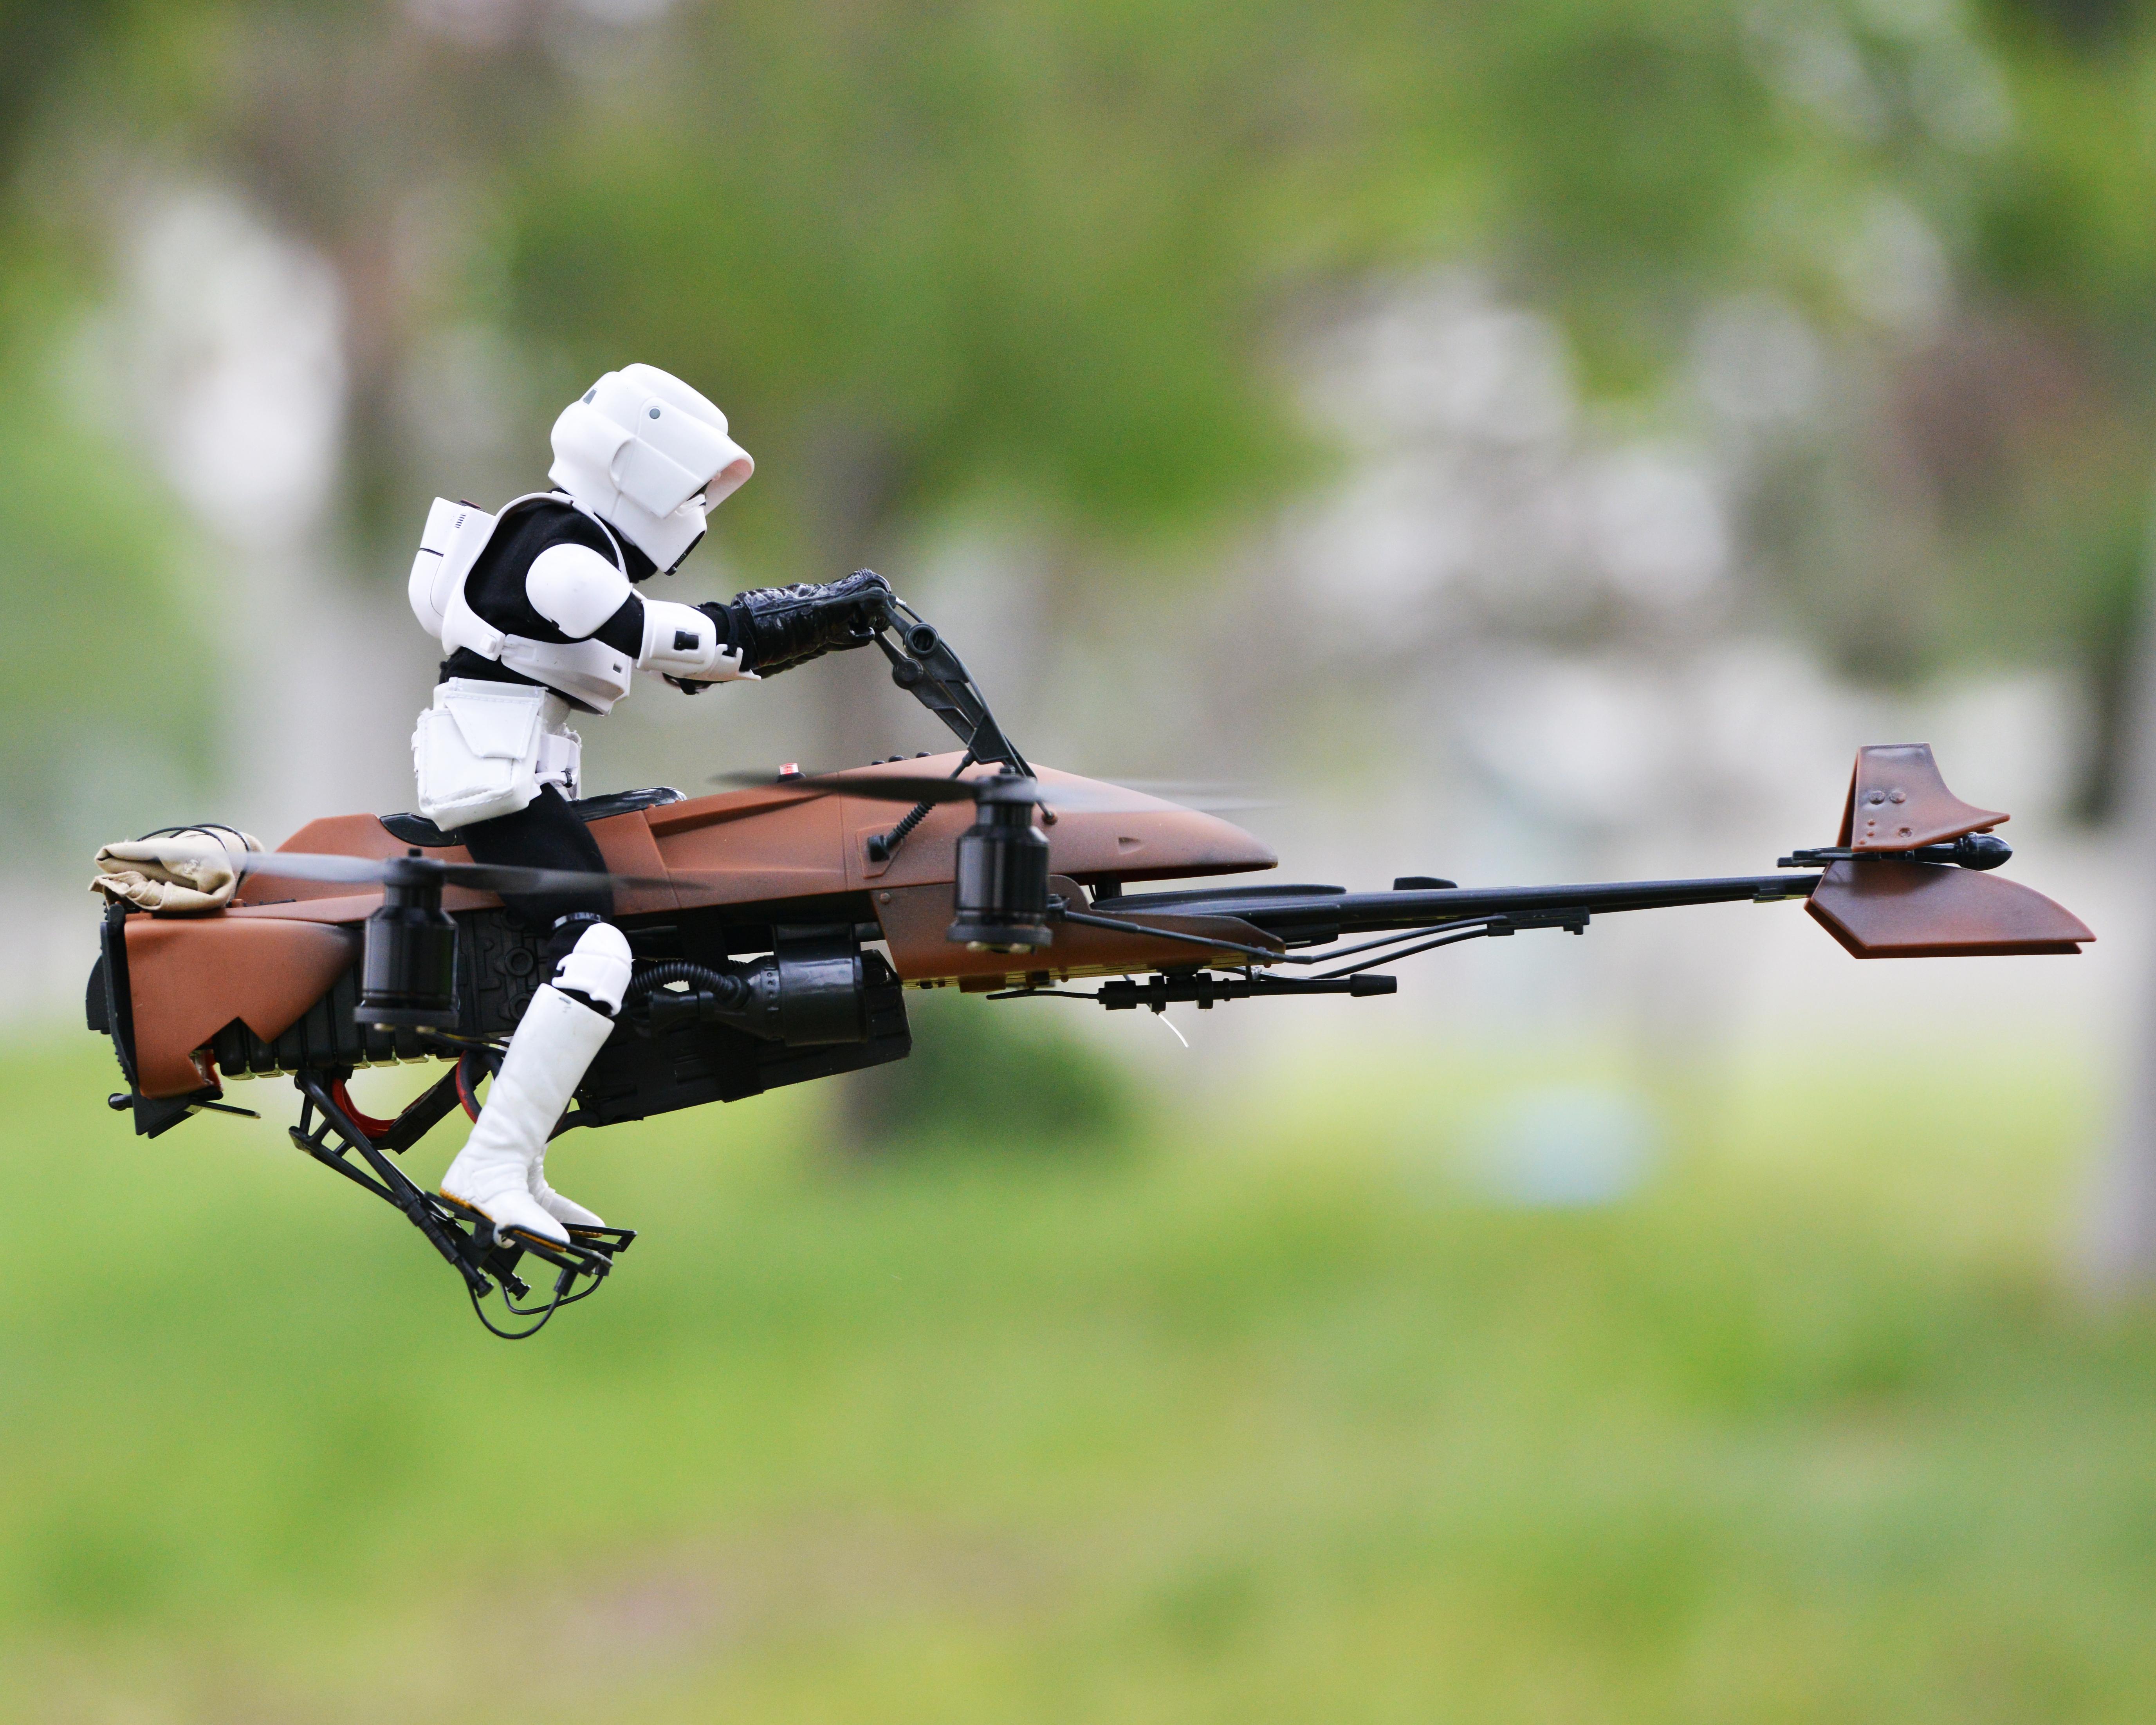 Fpv Star Wars Speeder Bike Quadcopter Make